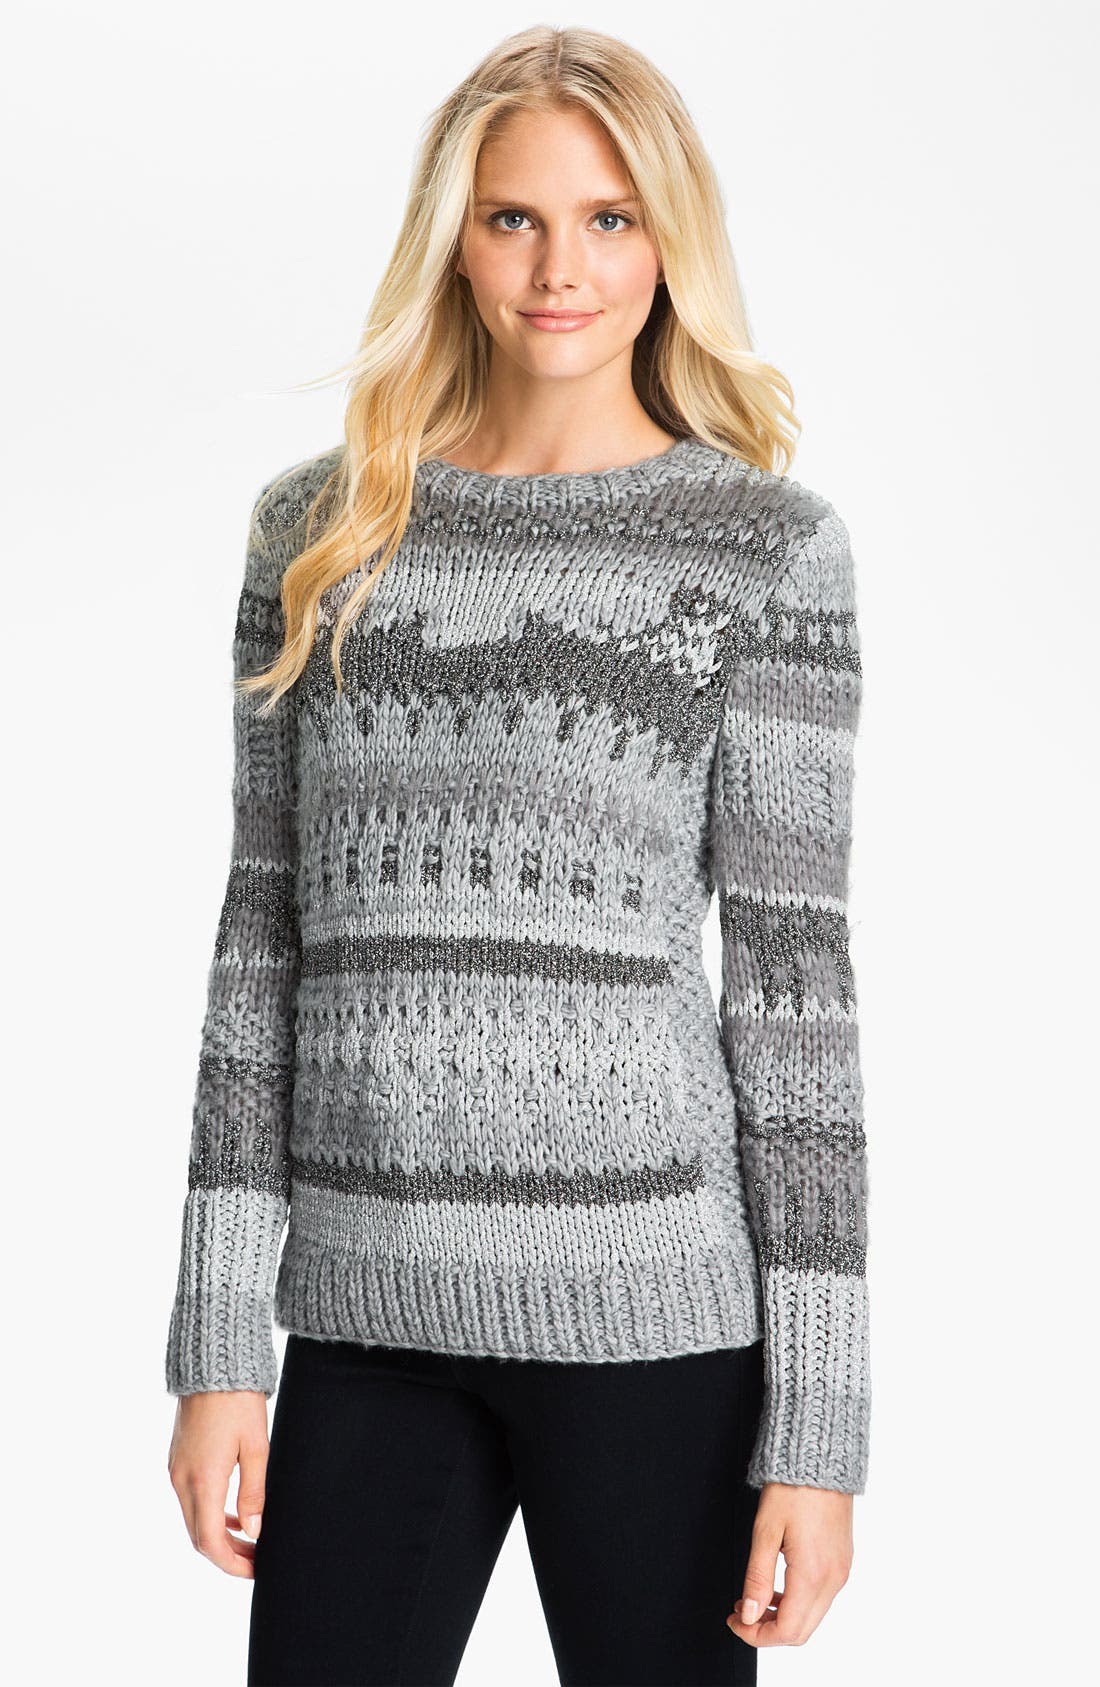 Main Image - MICHAEL Michael Kors Textured Intarsia Sweater